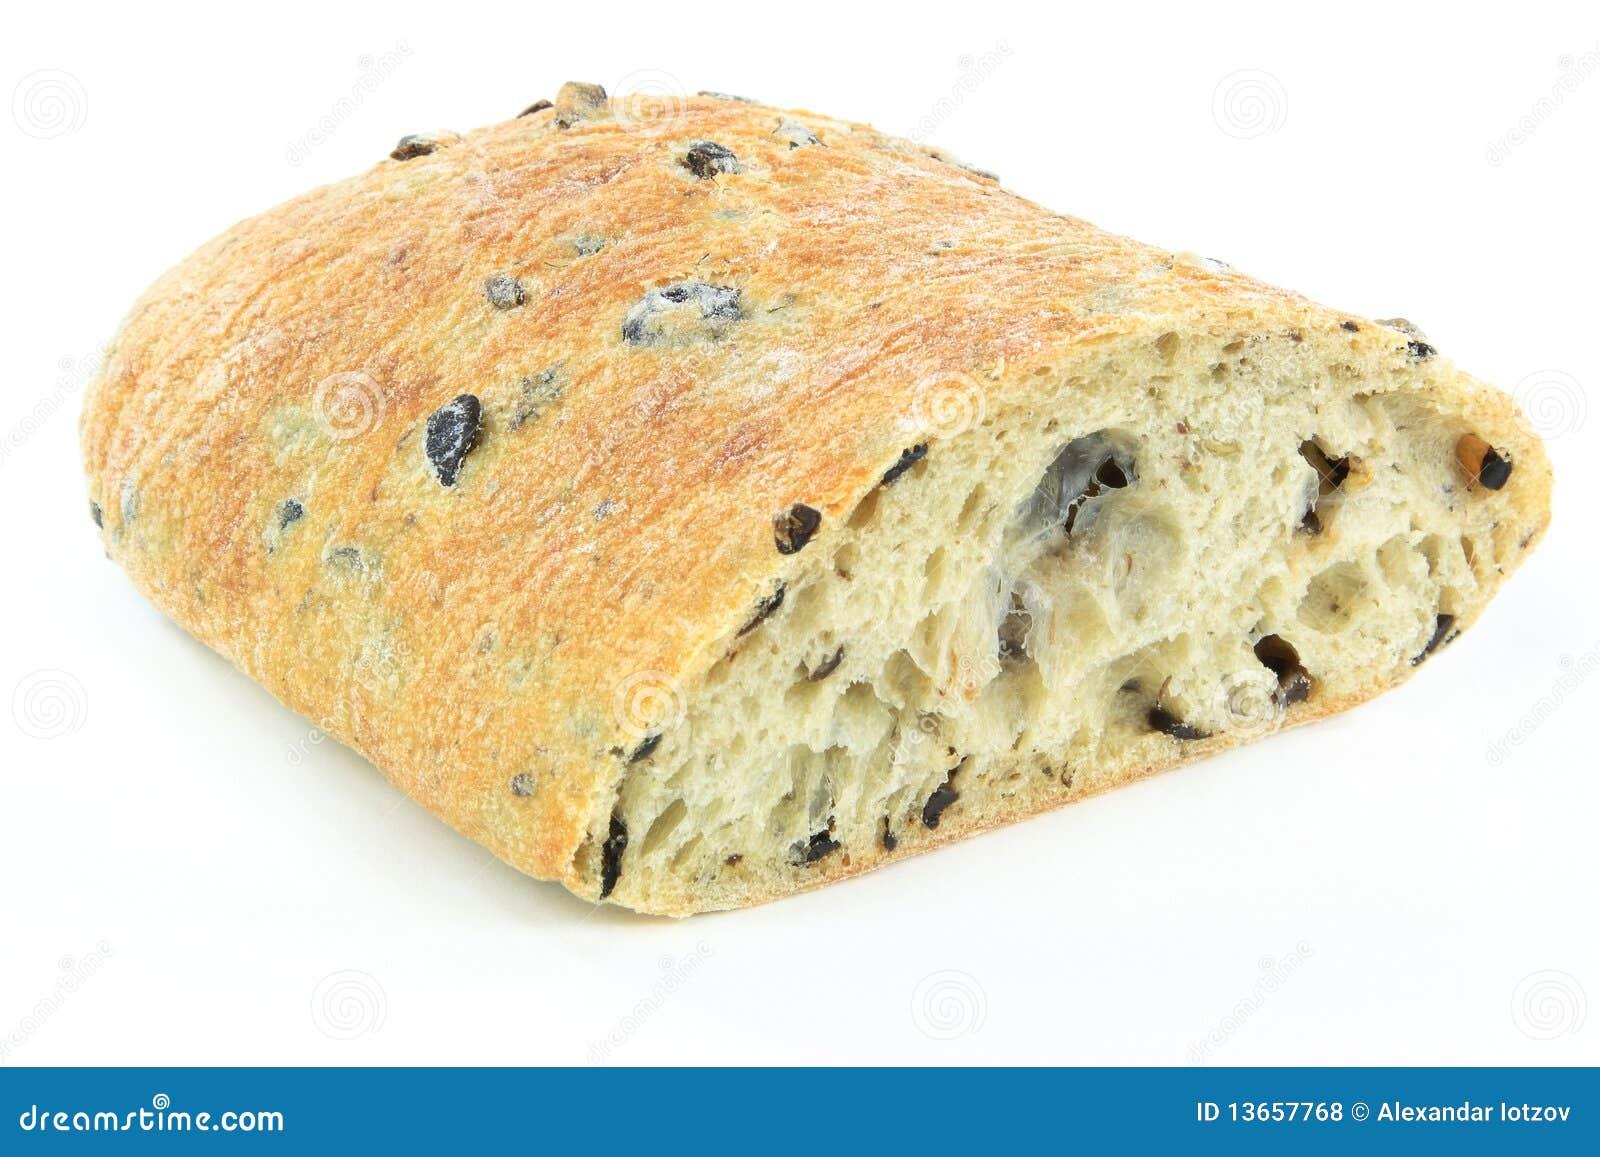 Cut on half Loaf Mediterranean Ciabatta black olive bread over white ...